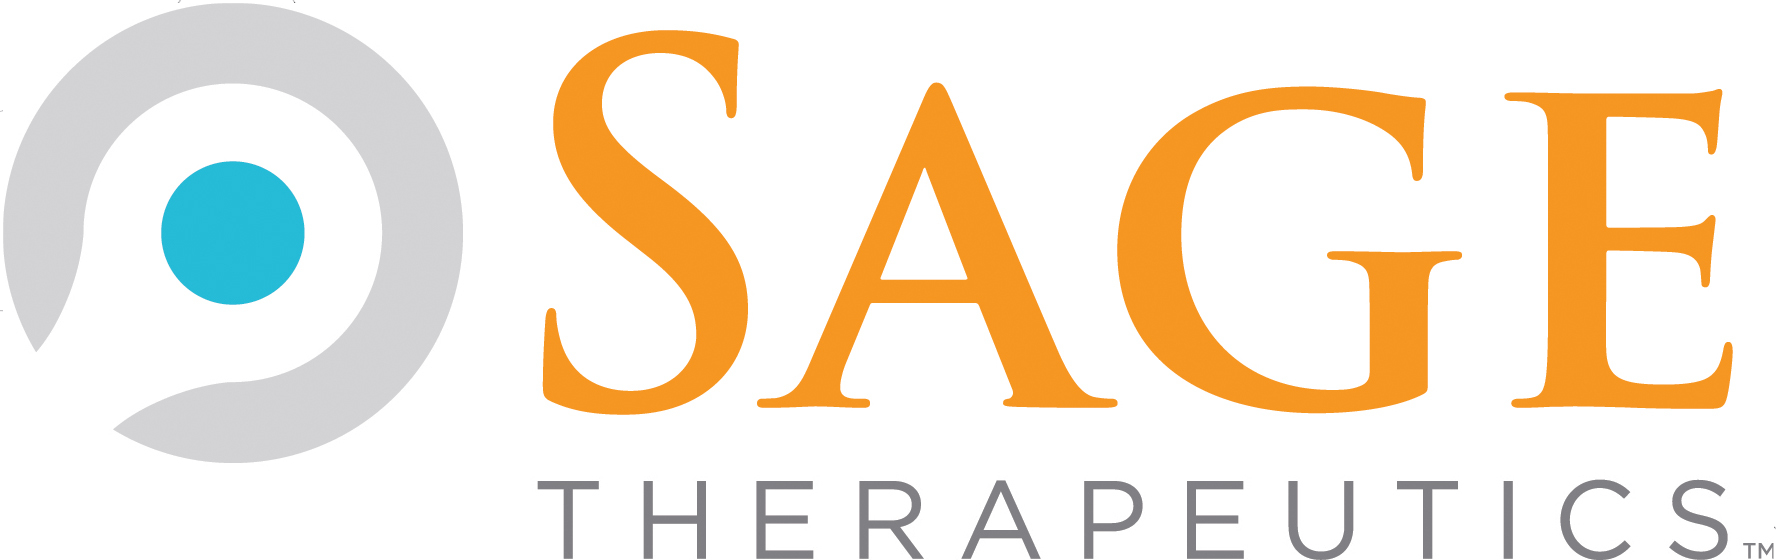 «Сейдж терапьютикс» (Sage Therapeutics).